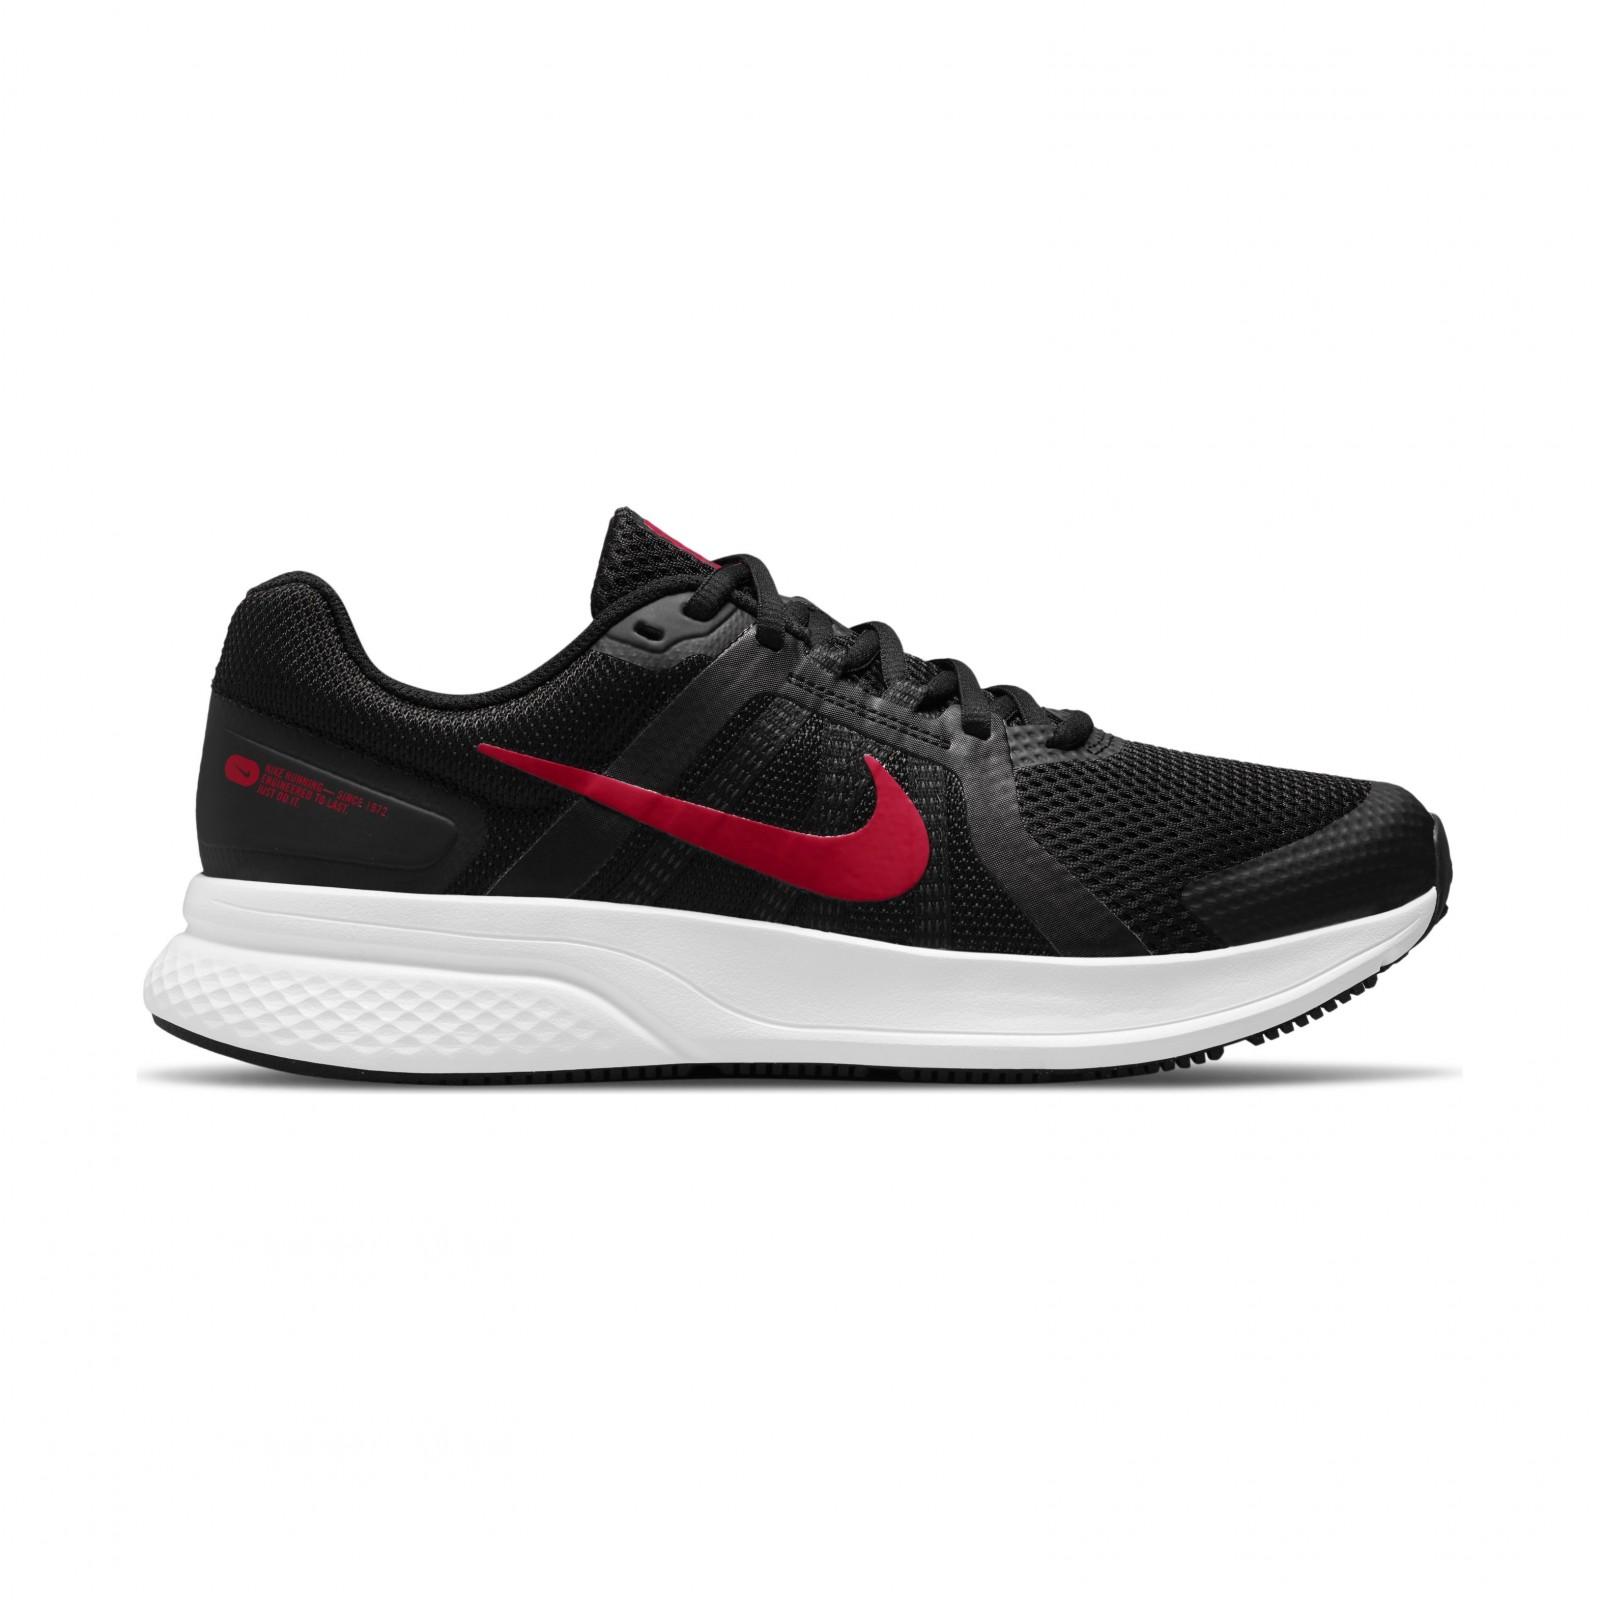 Nike run swift 2 black/white/red